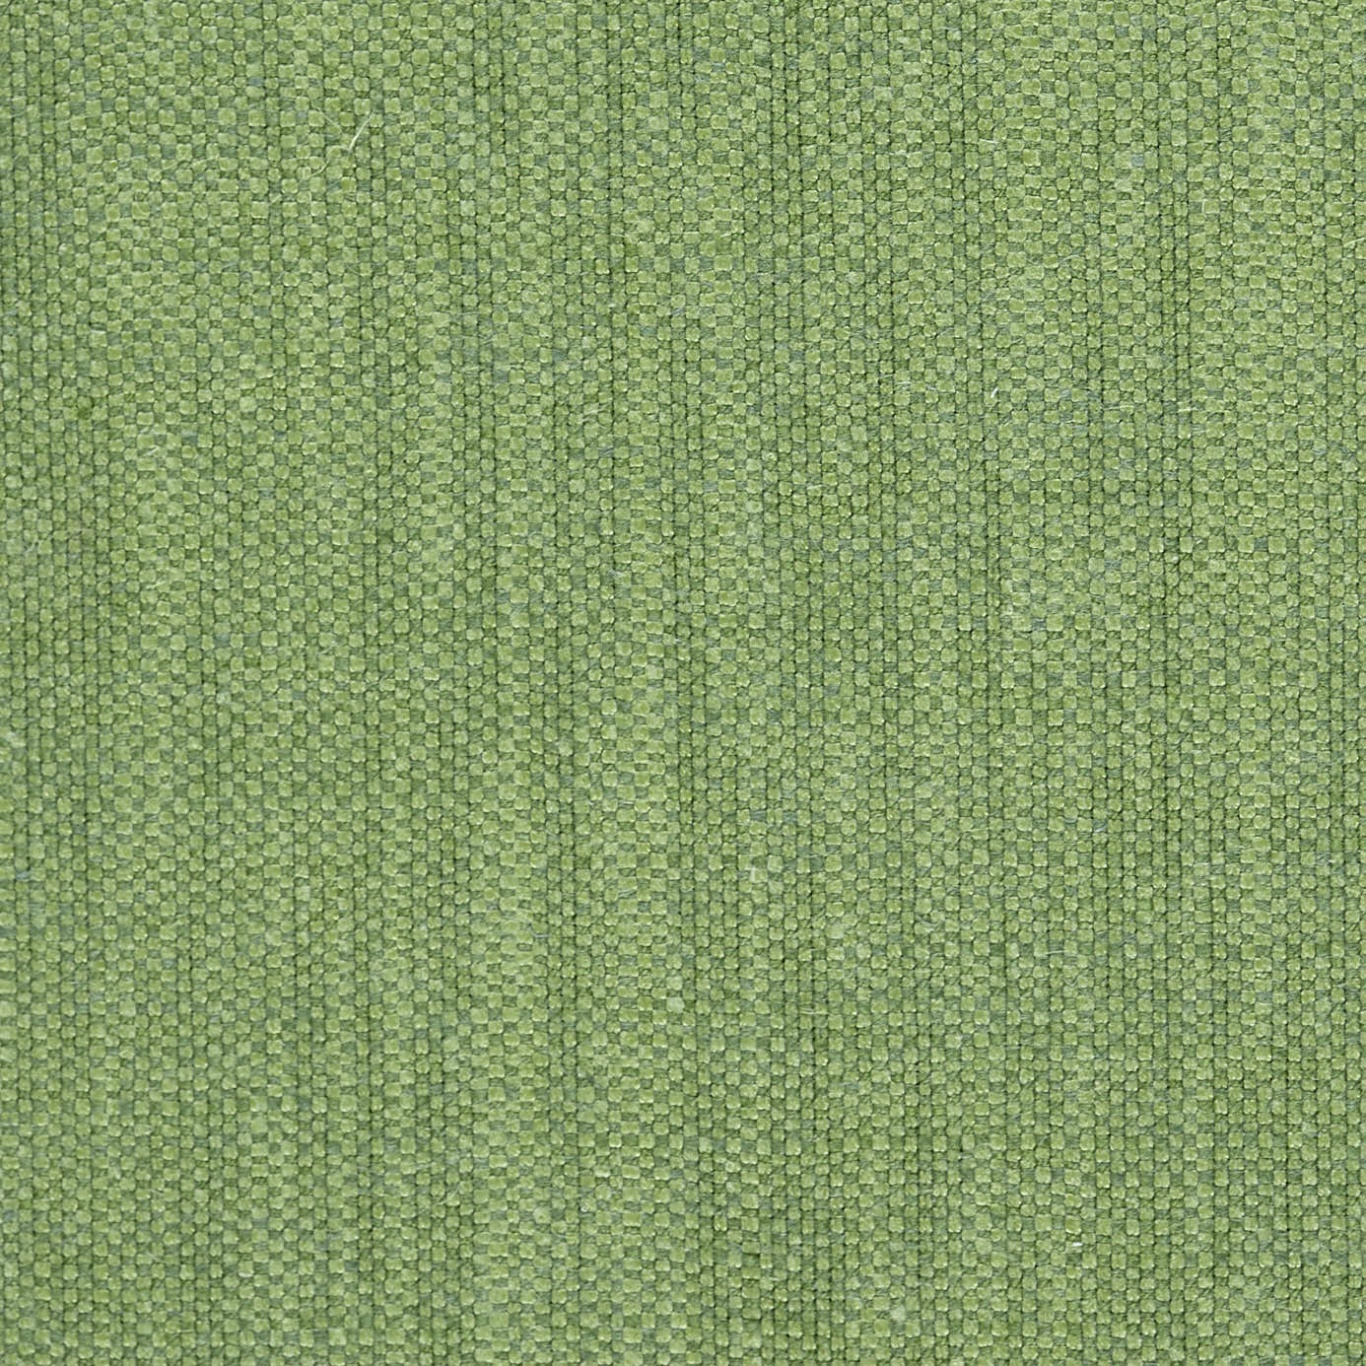 Image of Harlequin Atom Alpine Fabric 440045